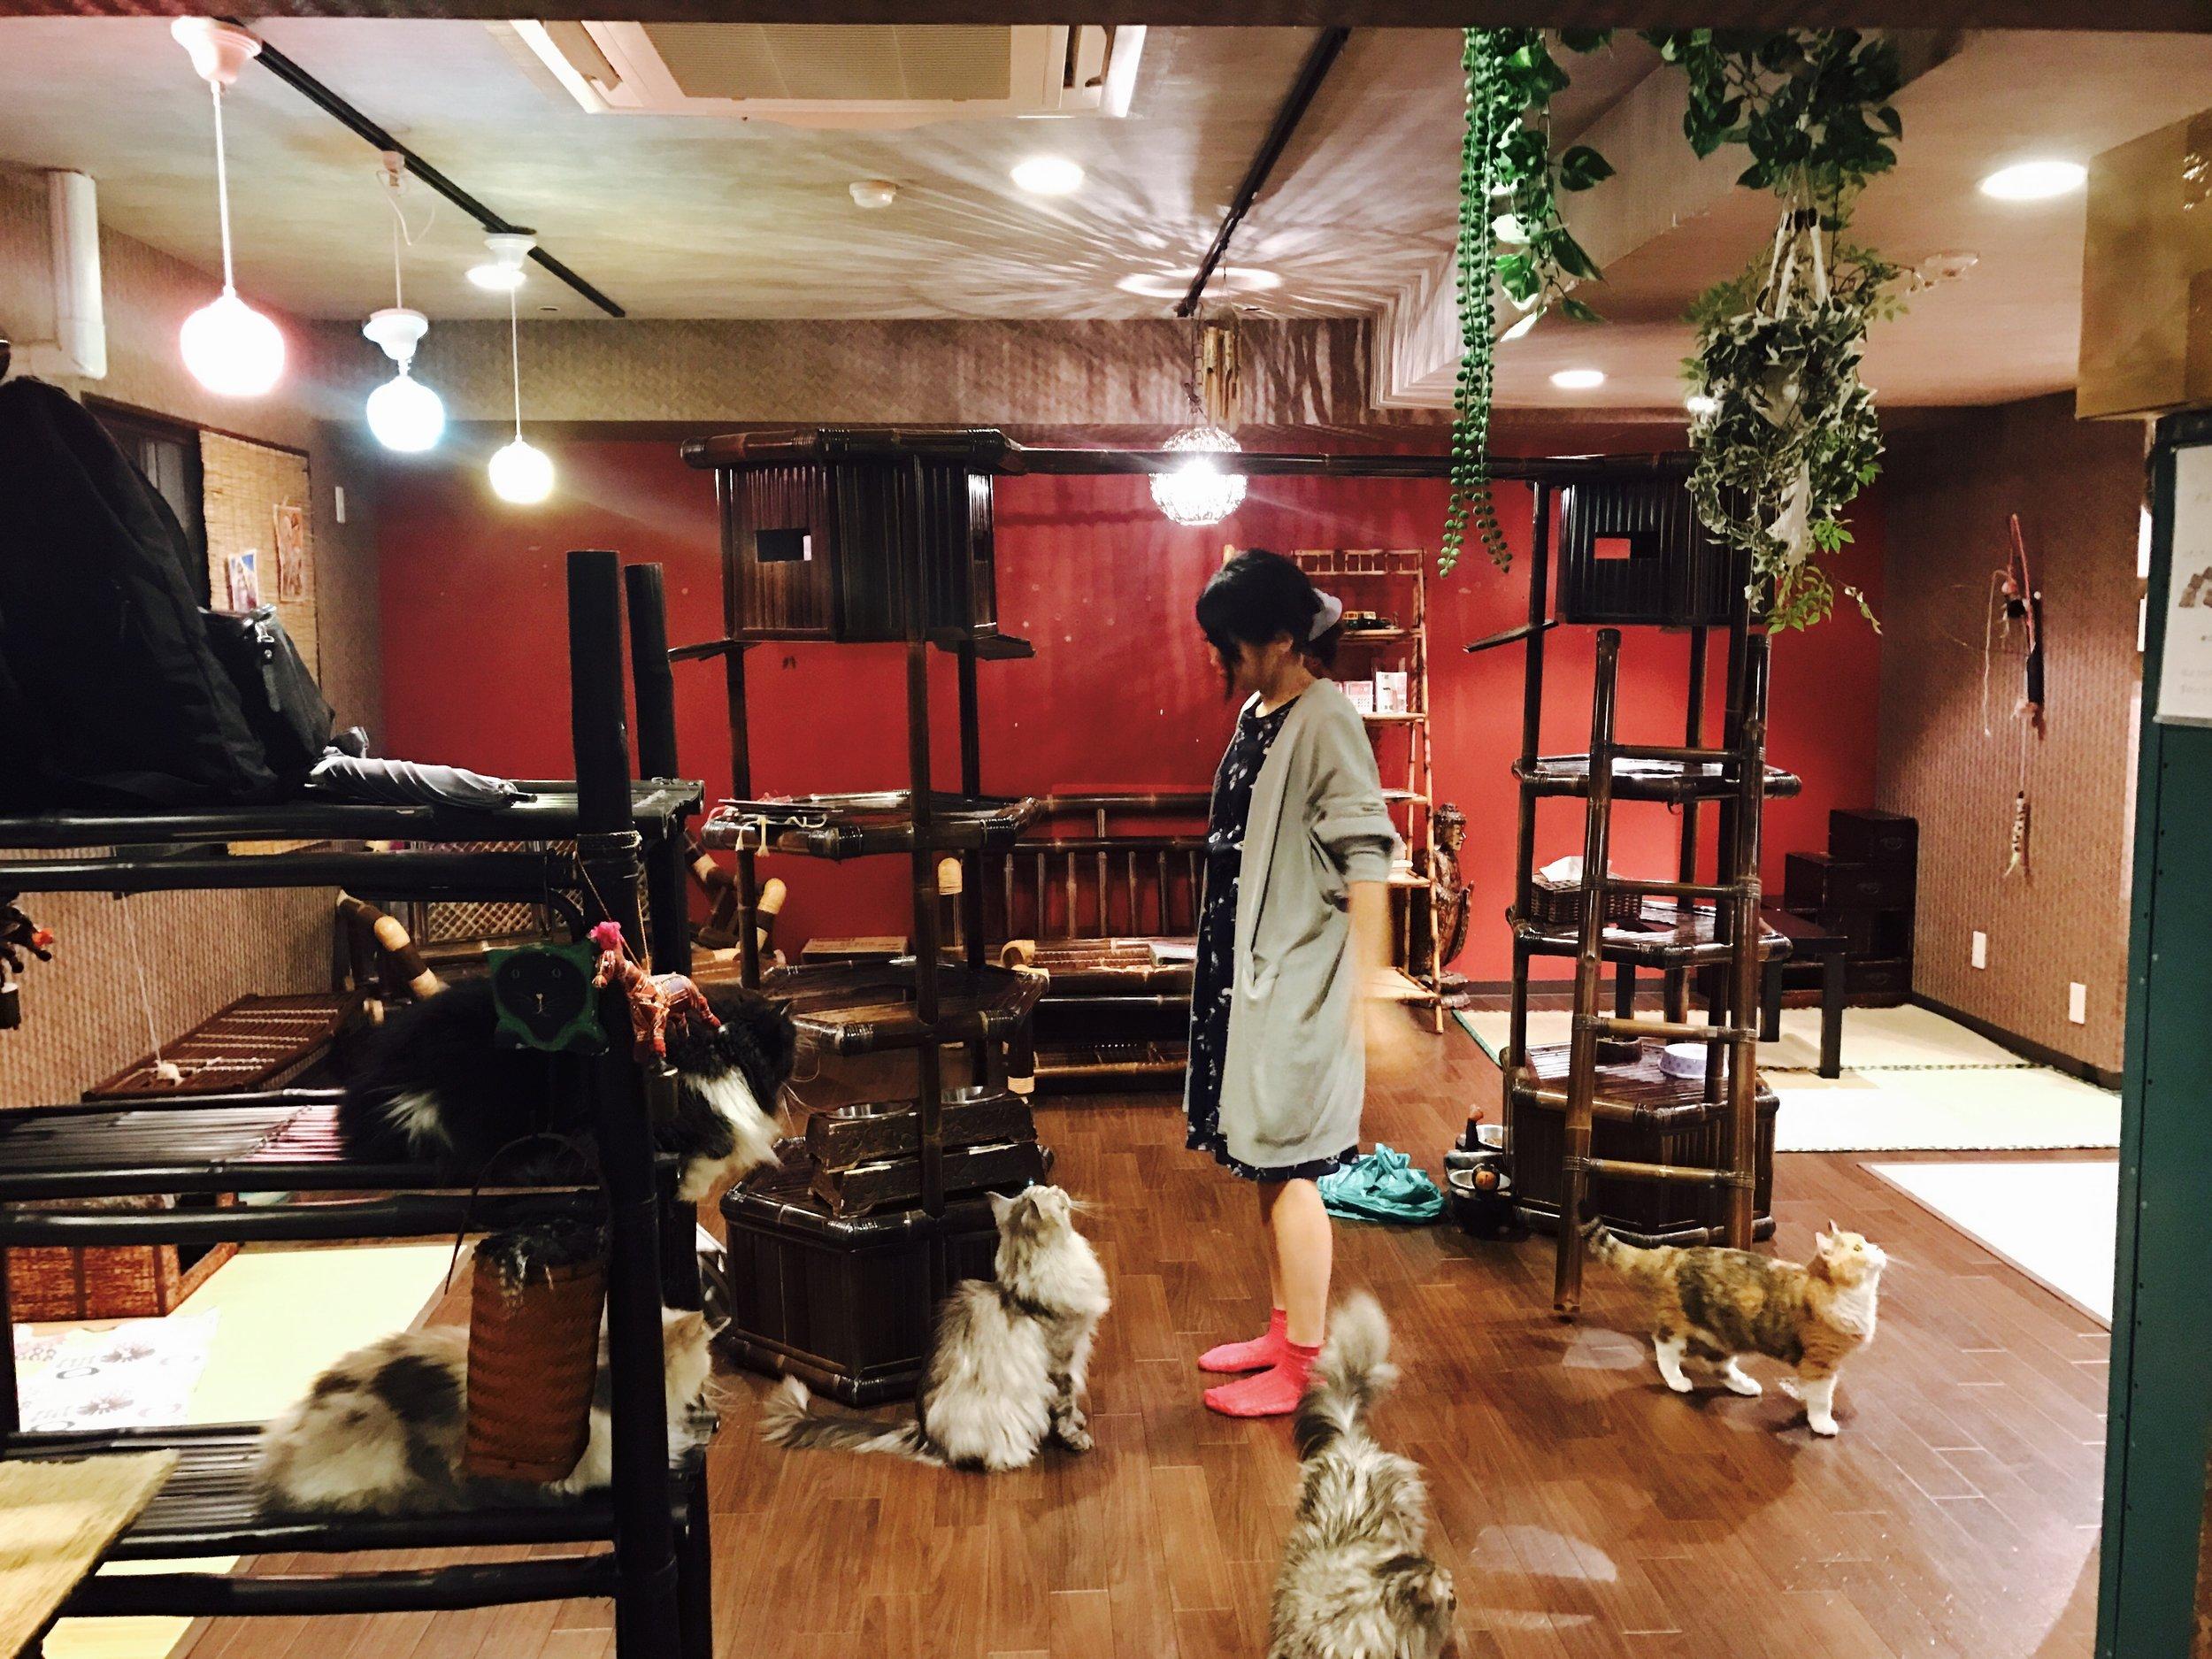 Vintage furniture and zen garden touches enhance the atmosphere at Gurugurudo Neko Cafe